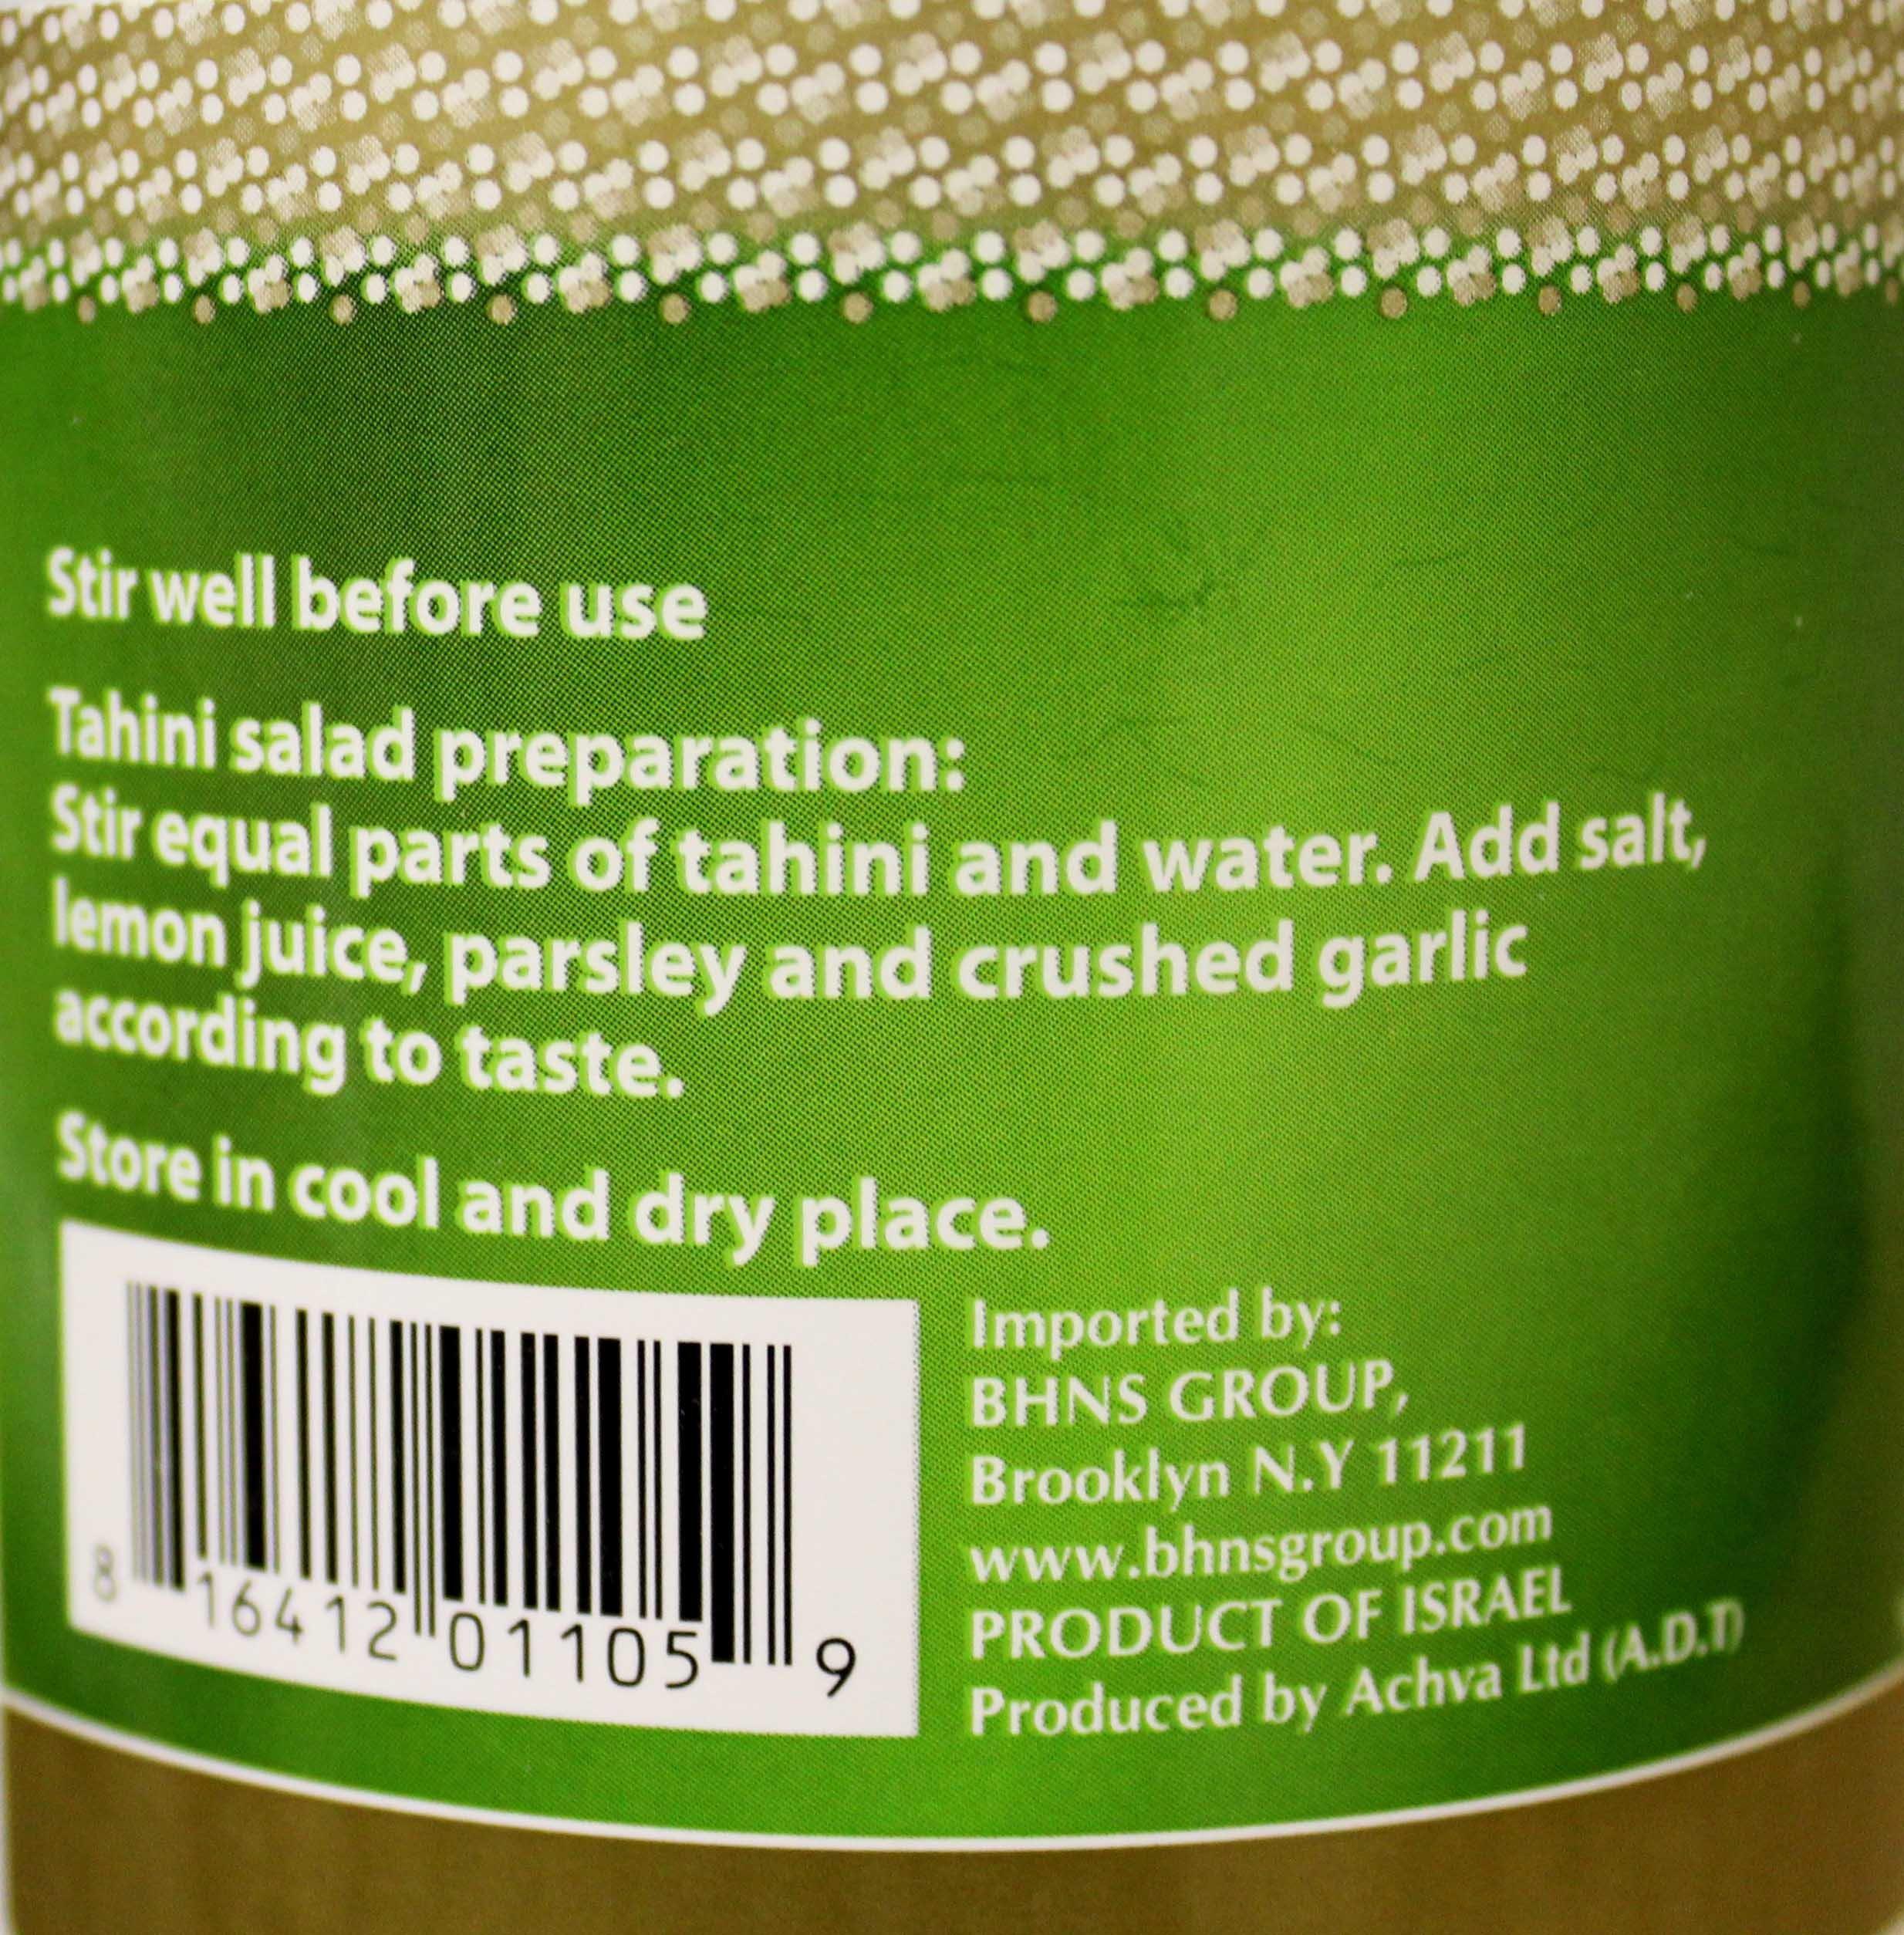 Baron's Kosher USDA Organic Pure Ground Sesame Tahini 16-ounce Jars (Pack of 4) by Baron's (Image #2)